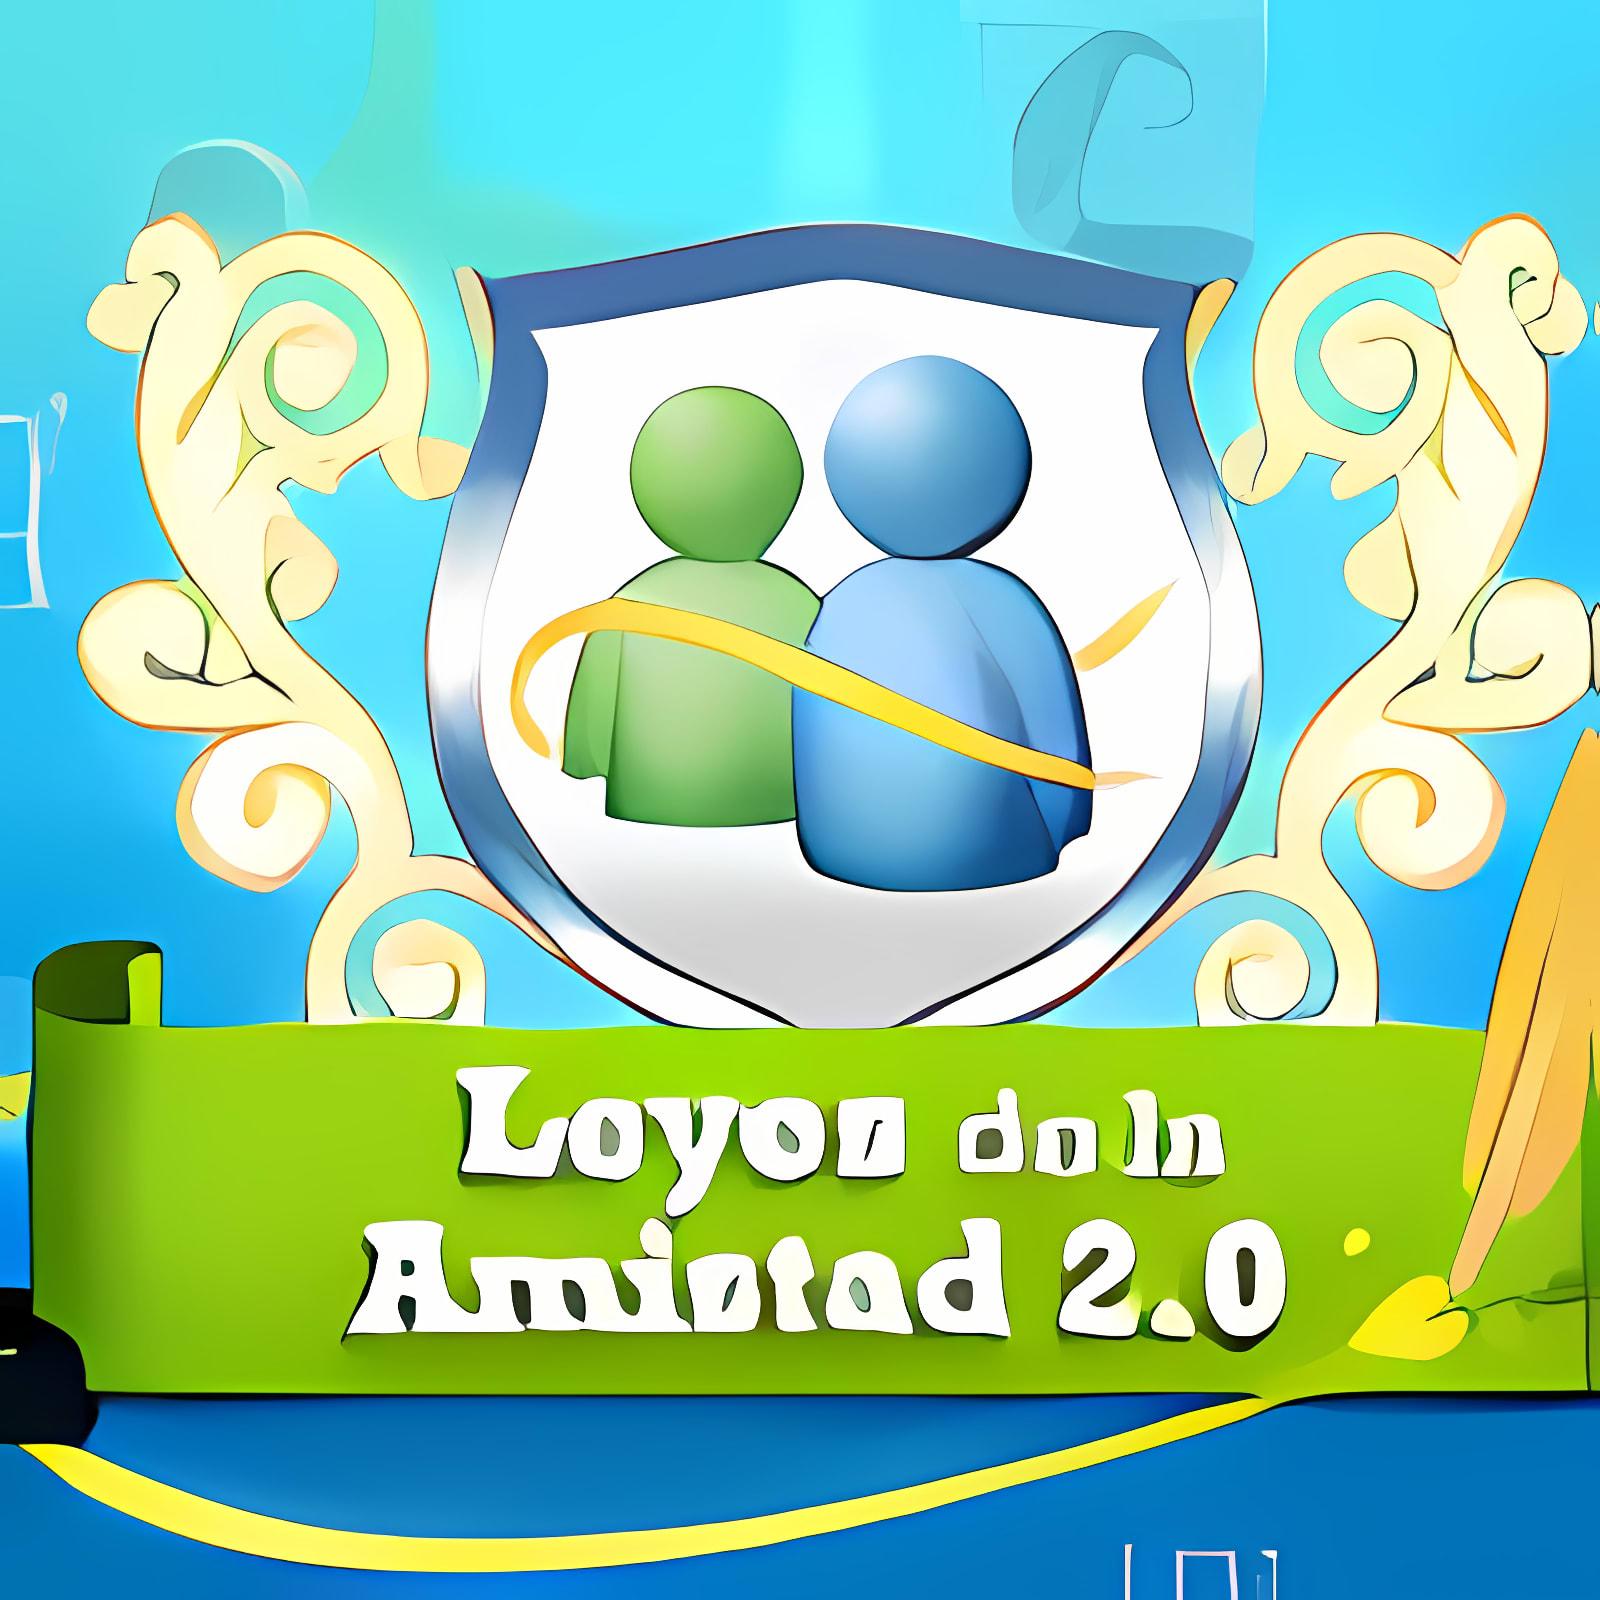 Messenger: Leyes de la Amistad 2.0